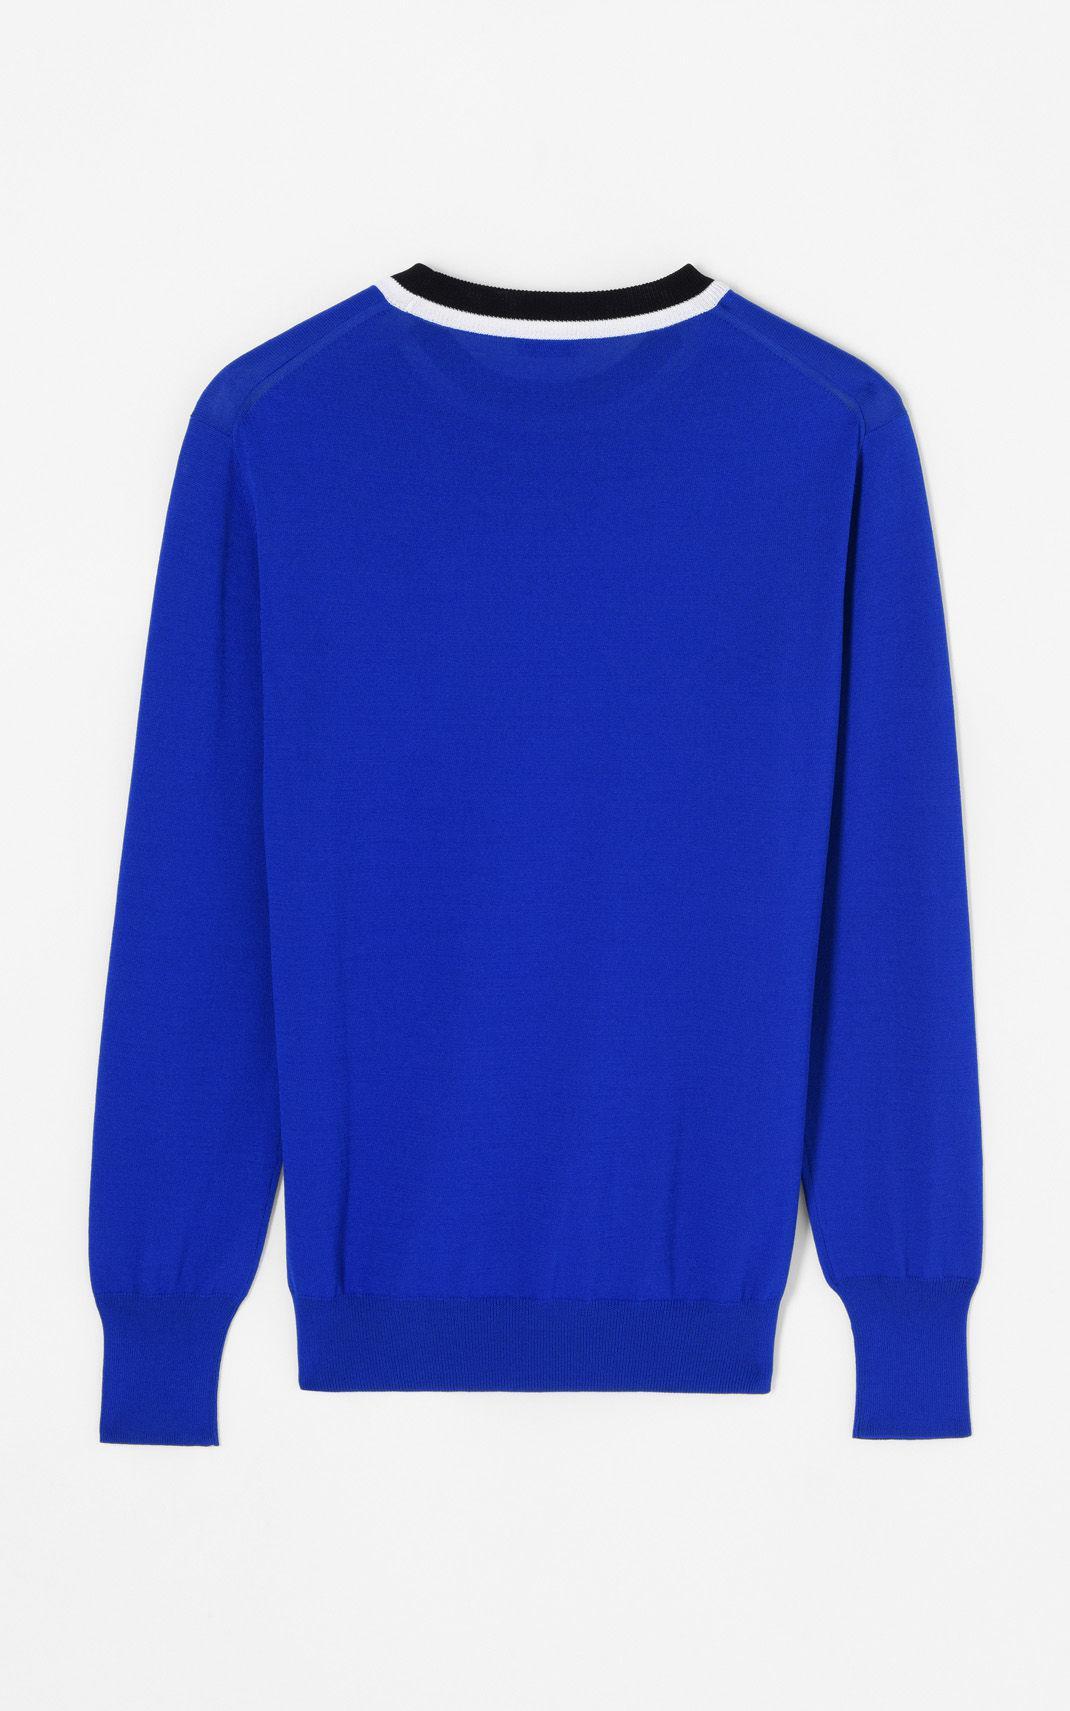 5768ff6bdd30d Lyst - Kenzo Colourblock Jumper in Blue for Men